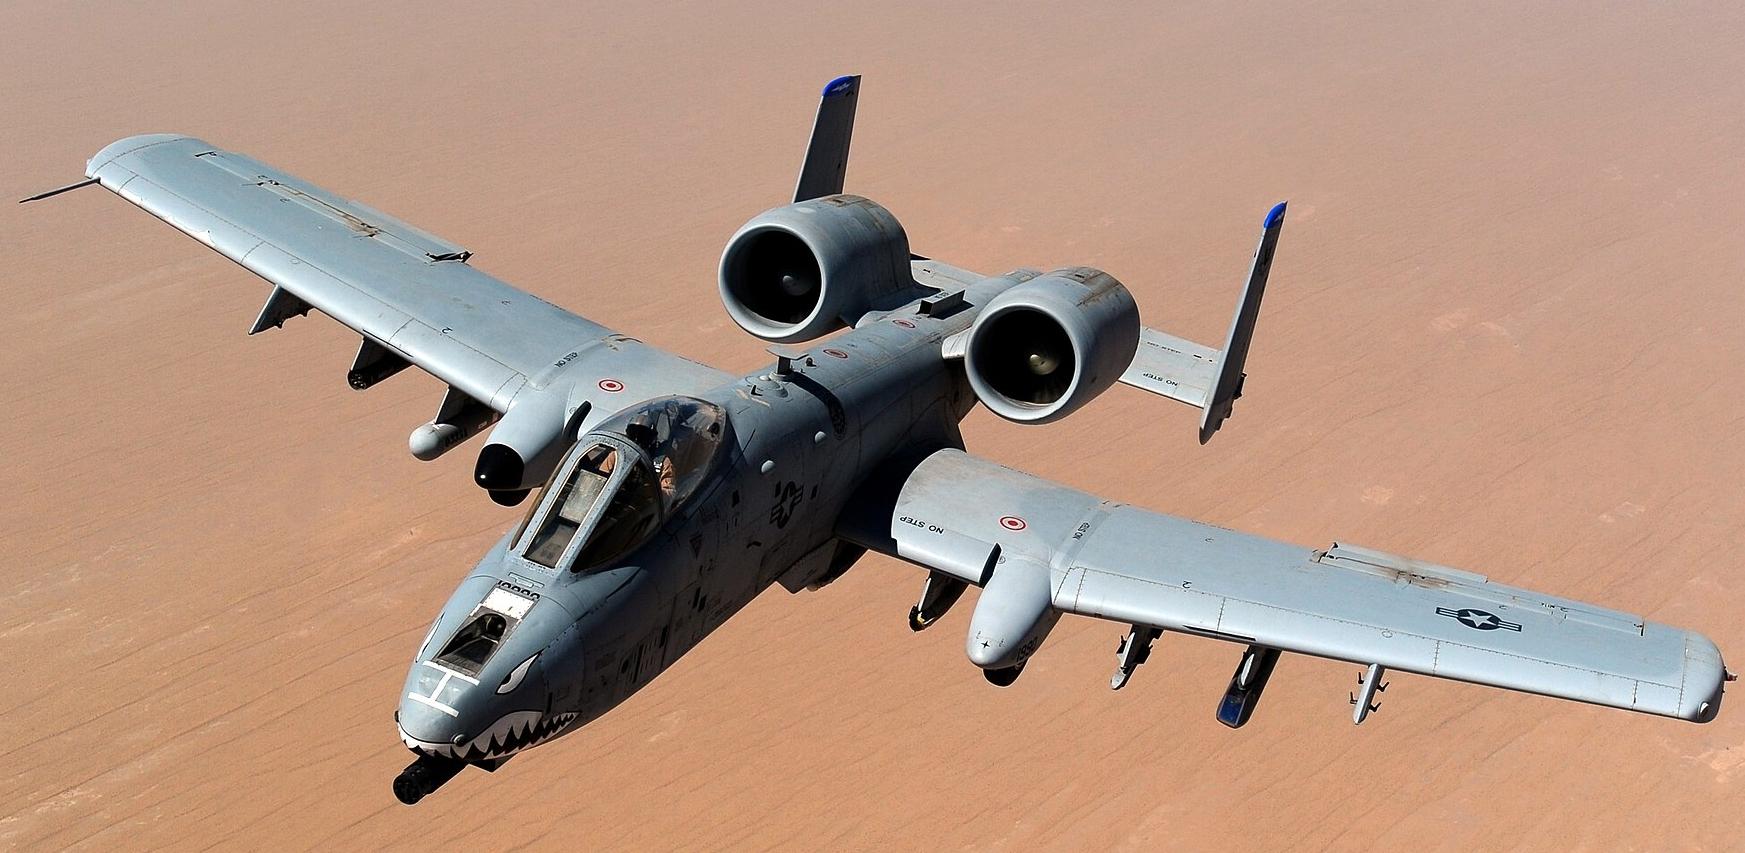 1920px-USAF_A-10_Thunderbolt_II_after_taking_on_fuel_over_Afghanistan.jpg